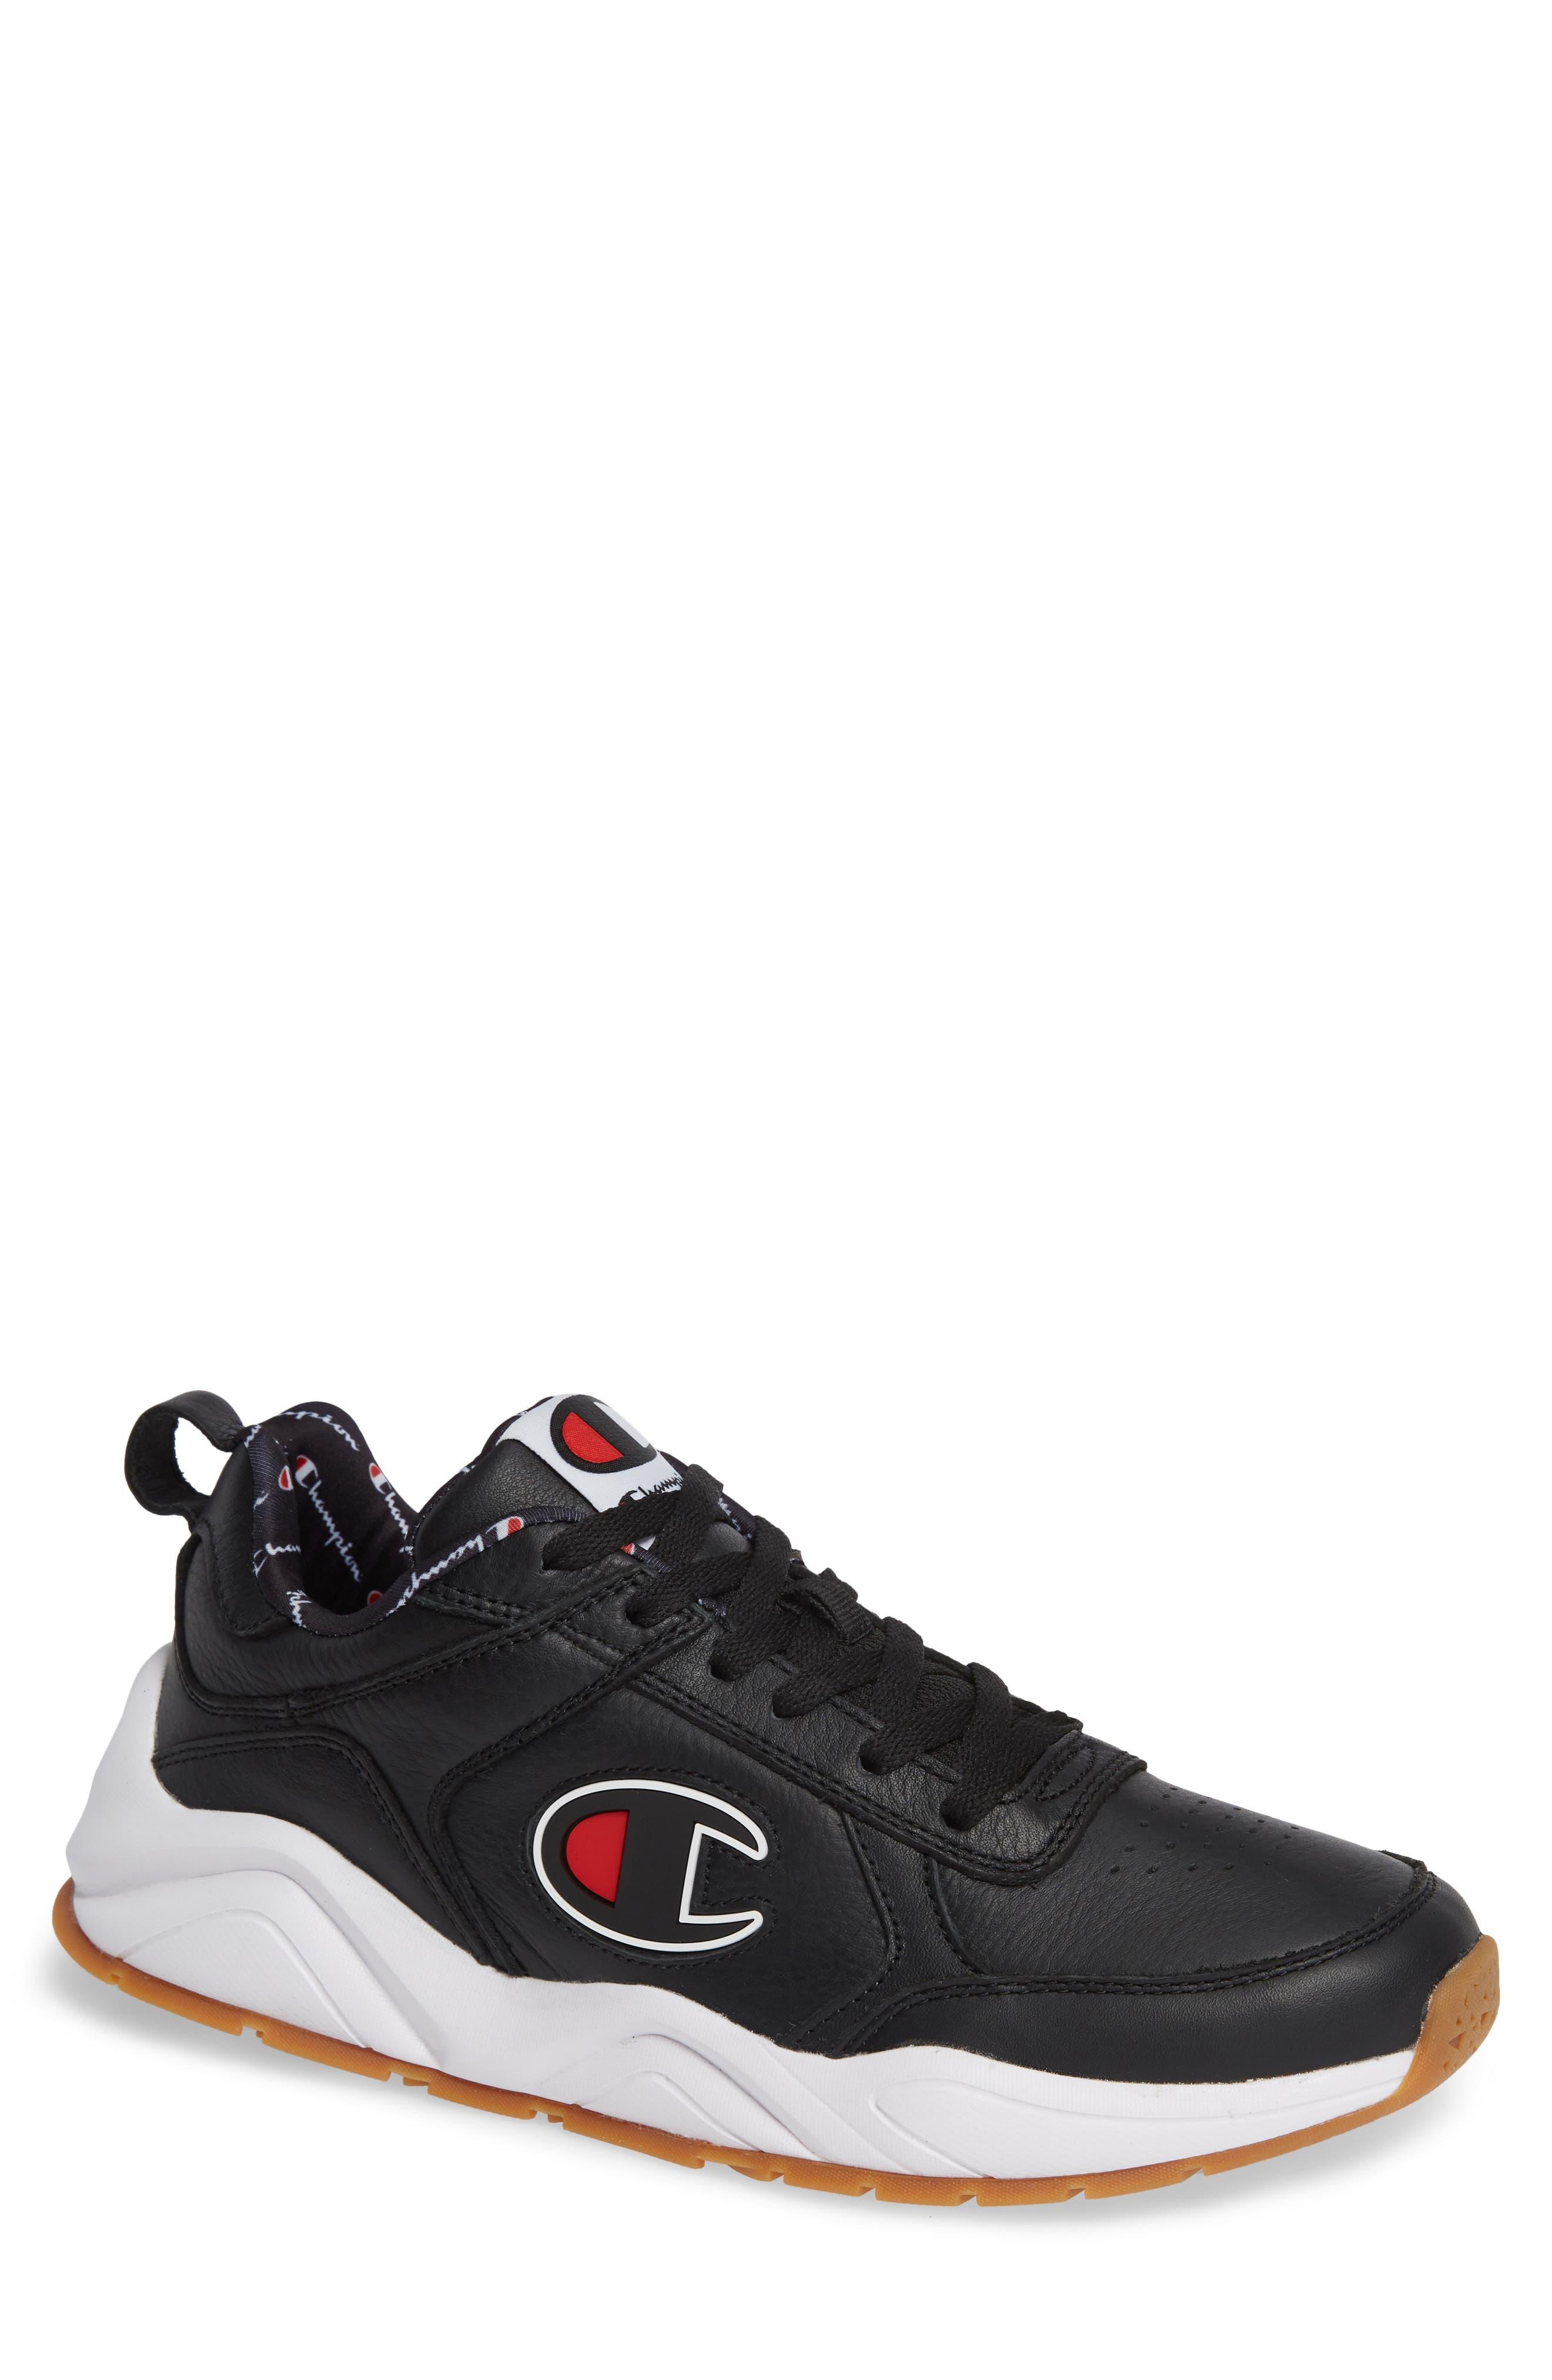 Bones Big-C Sneaker,                         Main,                         color, BLACK LEATHER